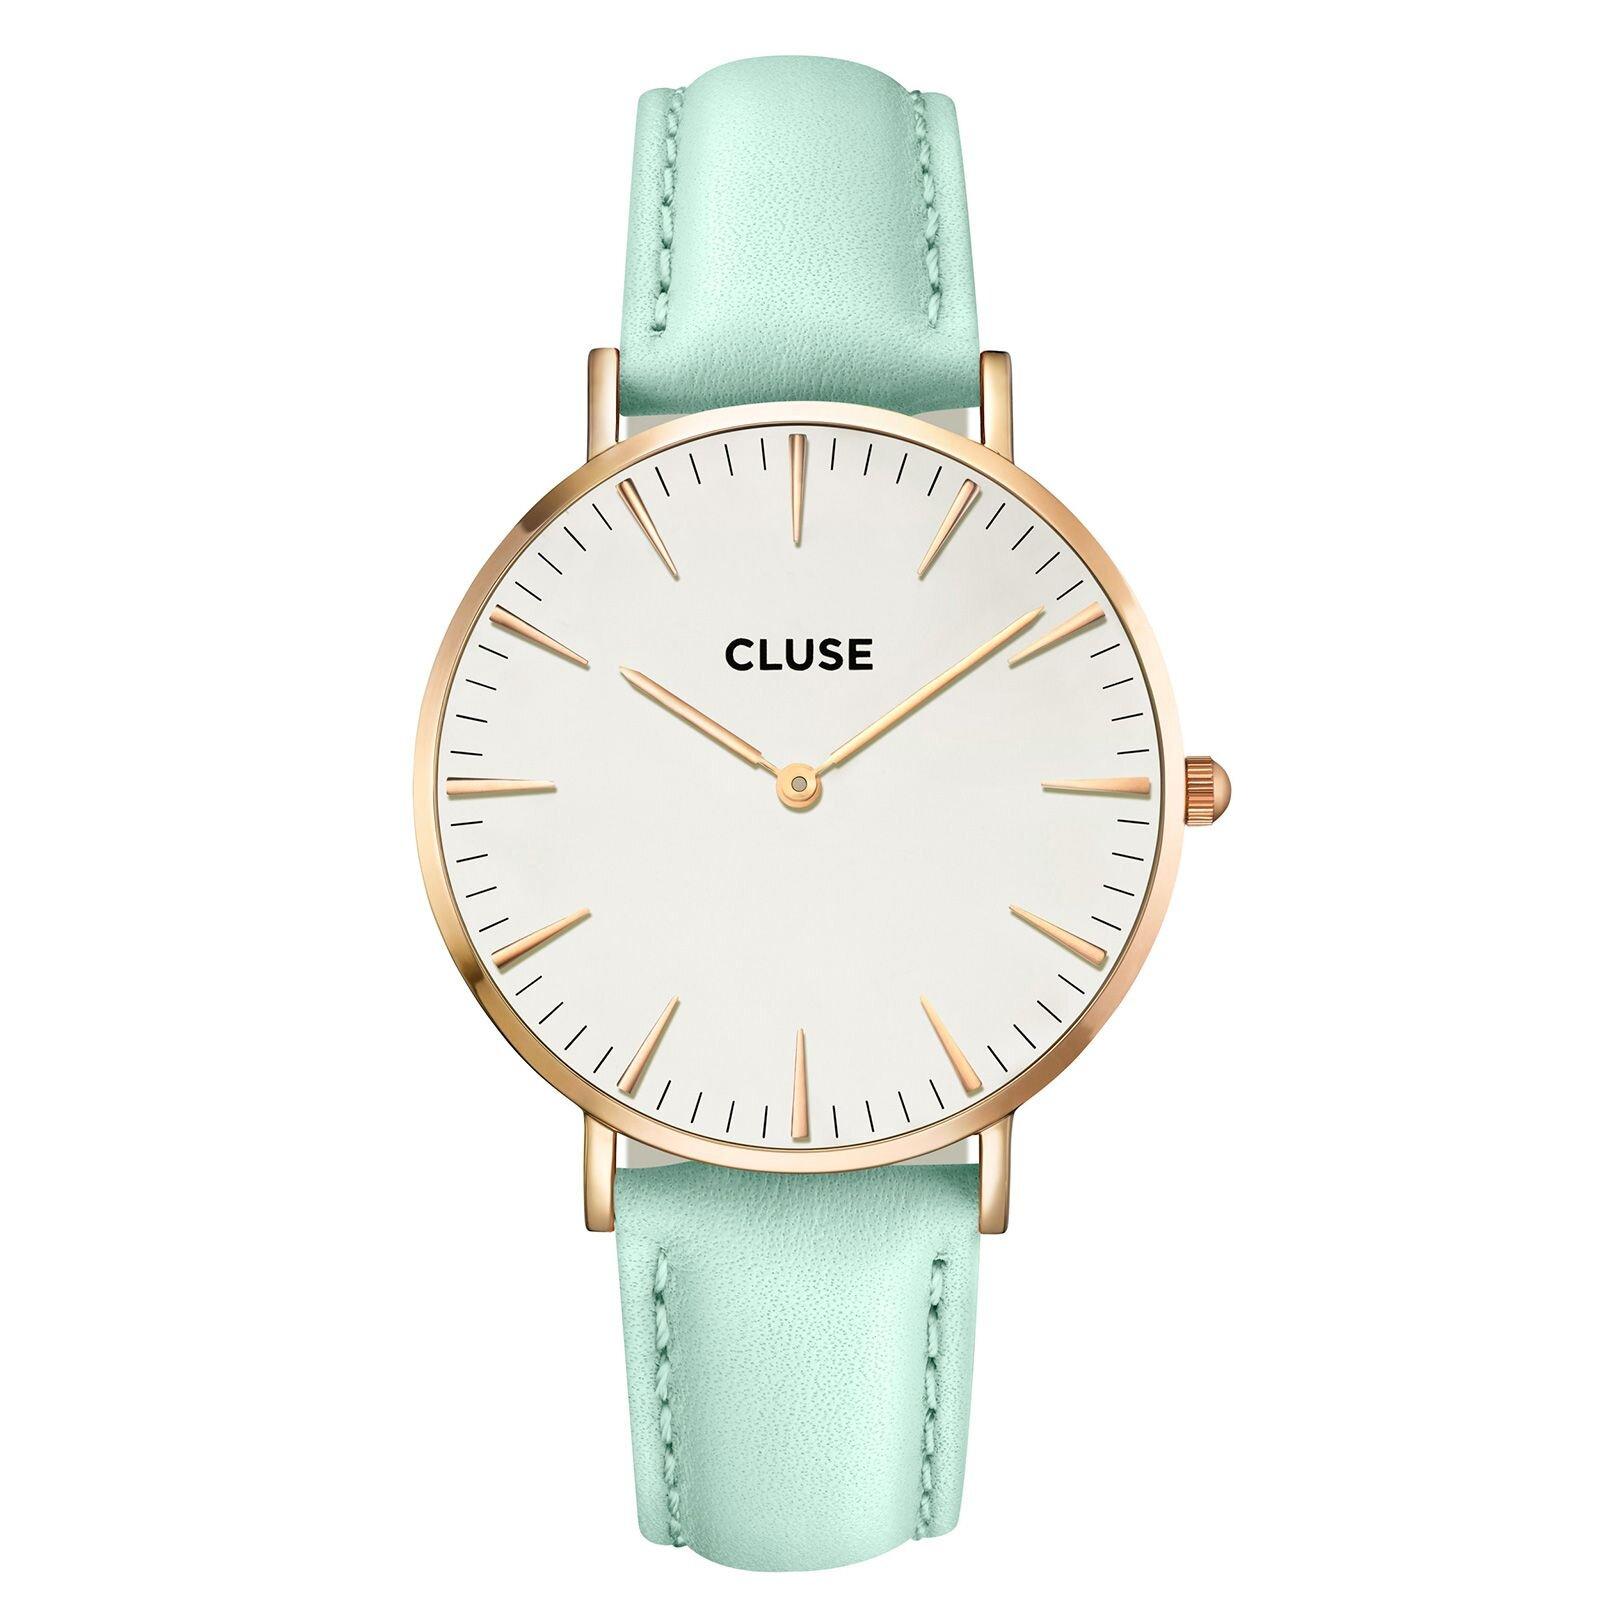 Đồng hồ nữ Cluse CL18021